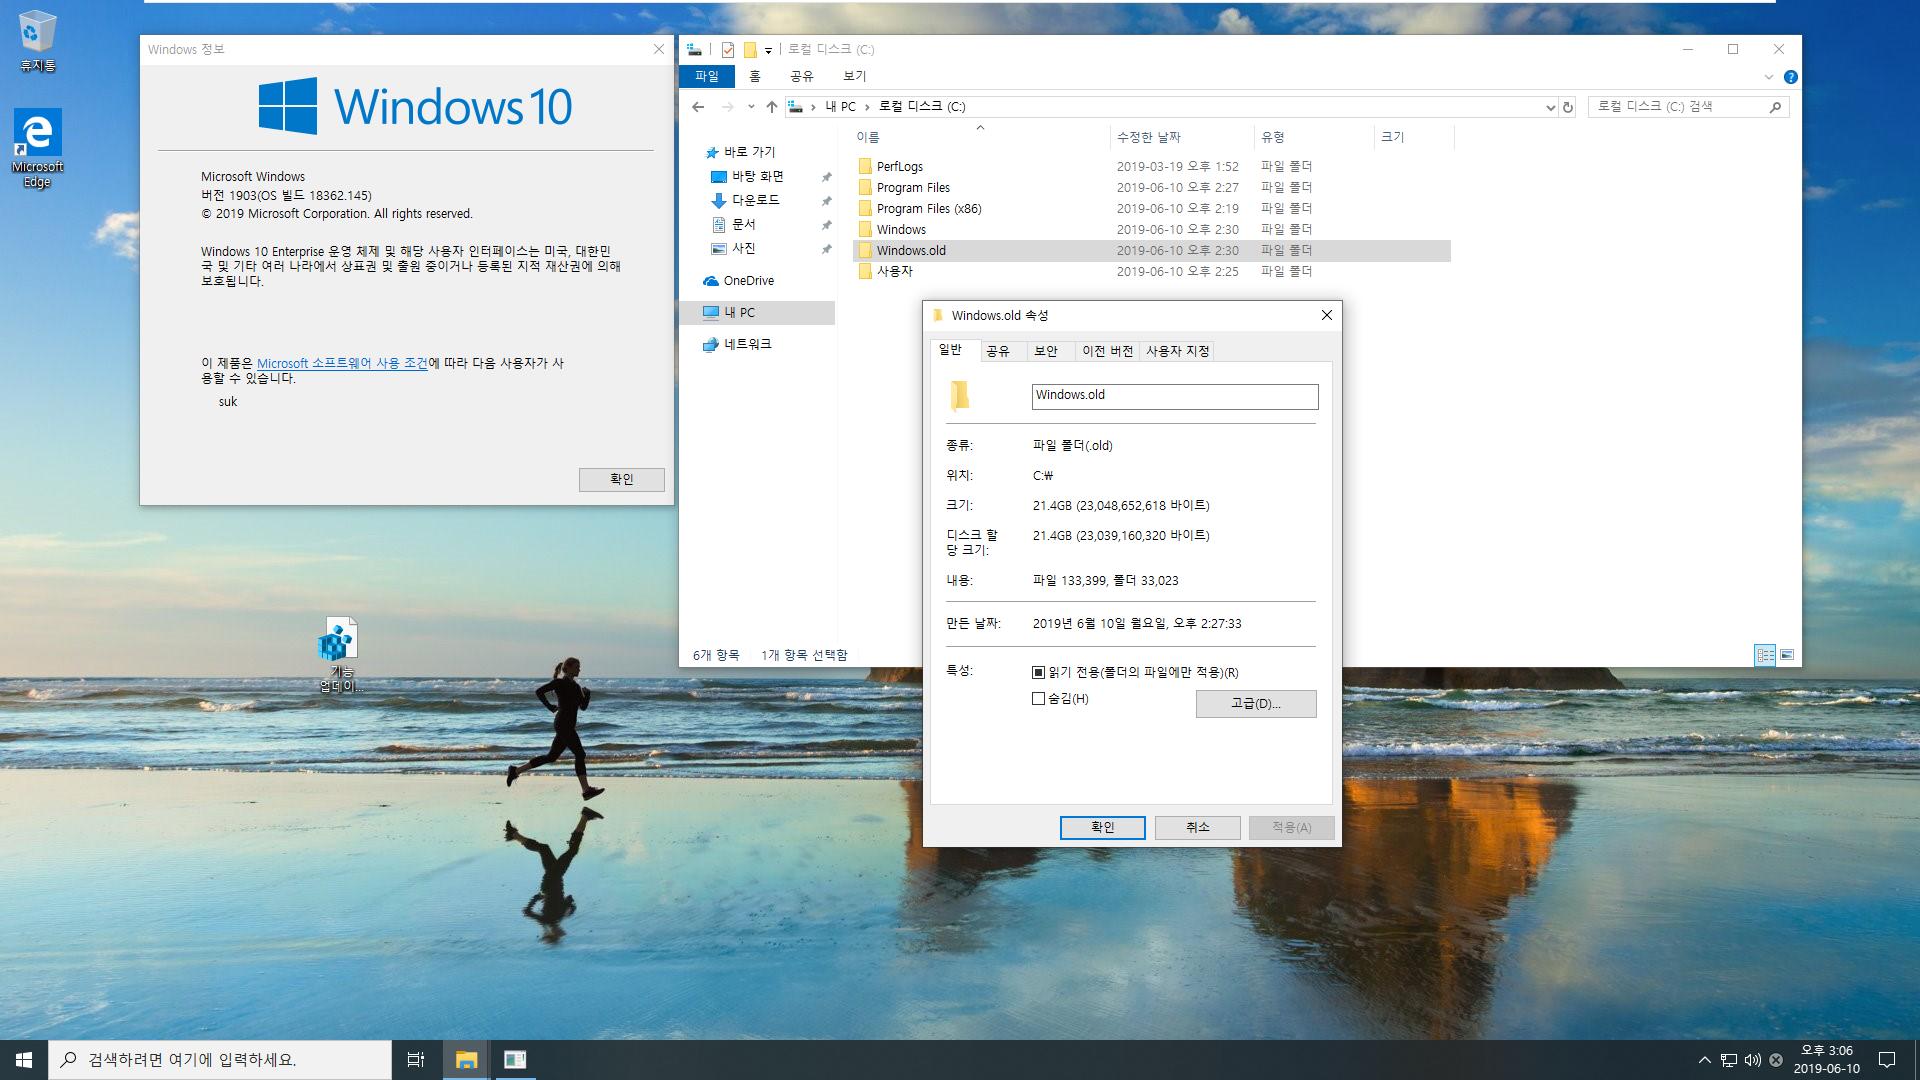 Windows 10 Enterprise LTSC [2019] - 버전 1809, 빌드 17763 - 버전 1903 기능 업데이트 테스트-msdn 중에 consumer 의 iso 실행하여 Enterprise kms 기본 키 넣으면 됩니다 - 업그레이드 성공 2019-06-10_150654.png